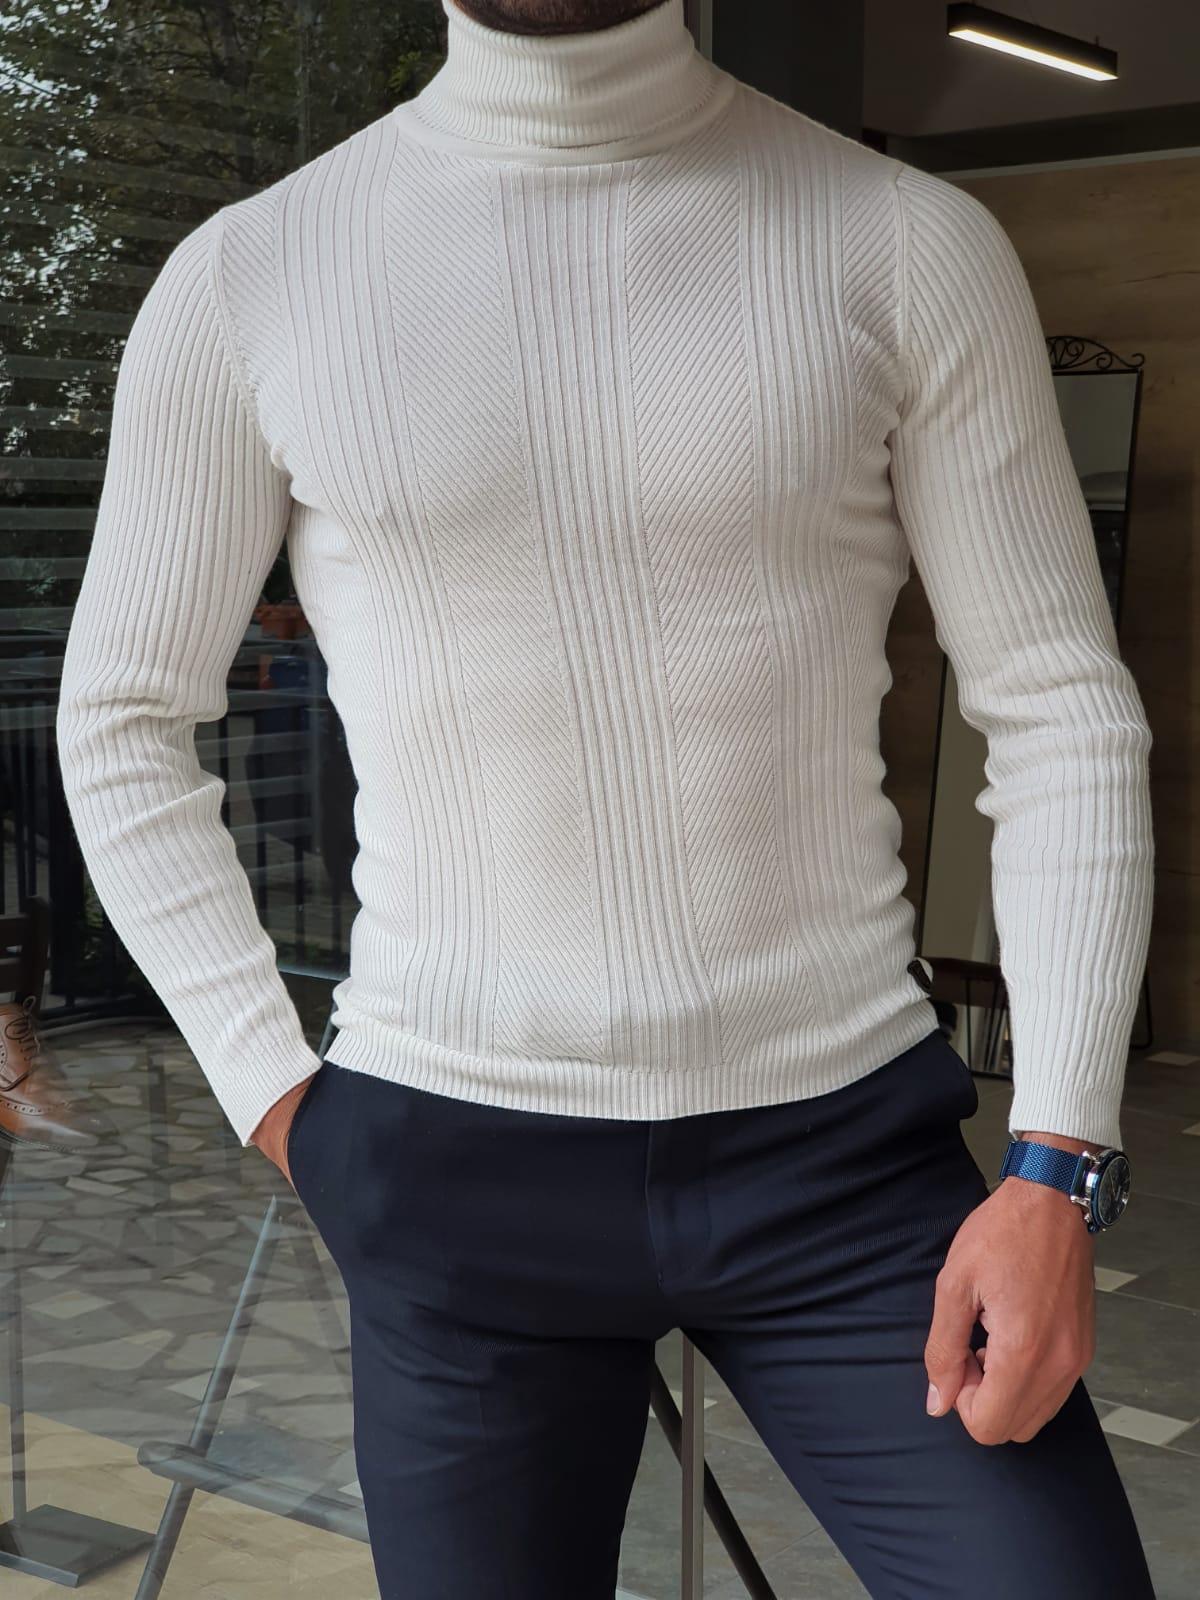 Aysoti Warren White Slim Fit Striped Turtleneck Wool Sweater